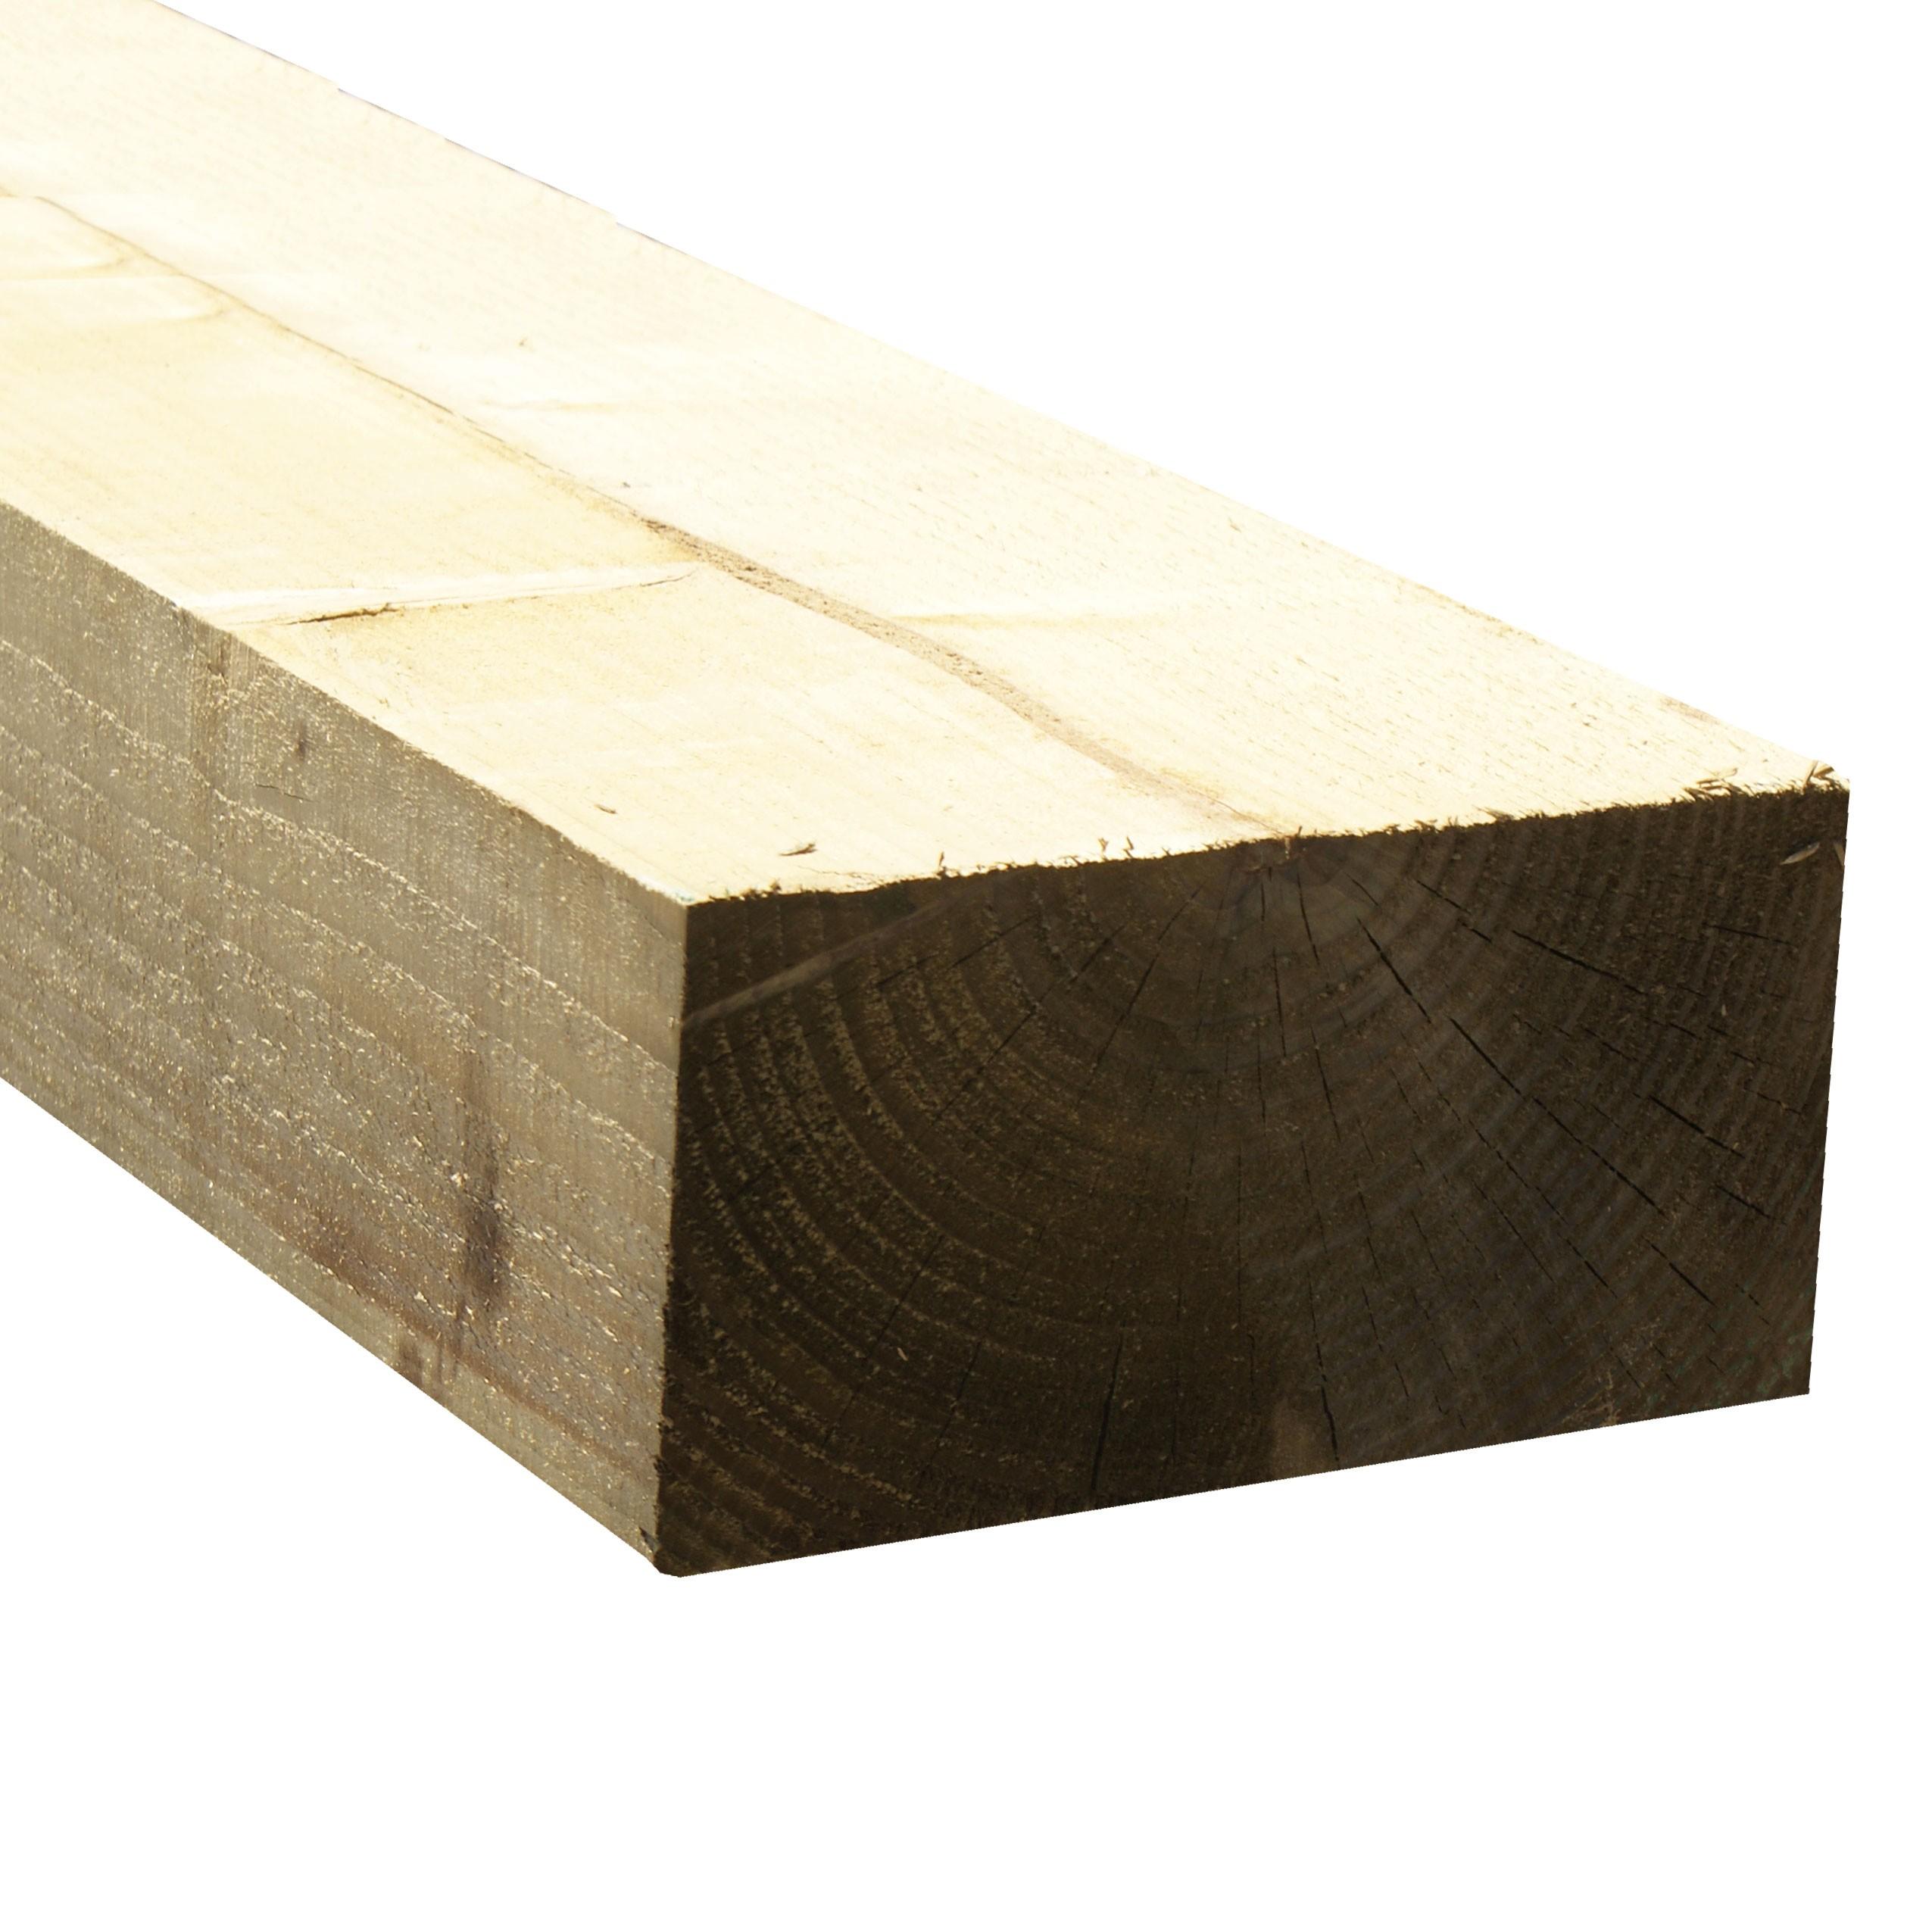 2400 x 200 x 100mm New Softwood Sleeper Treated